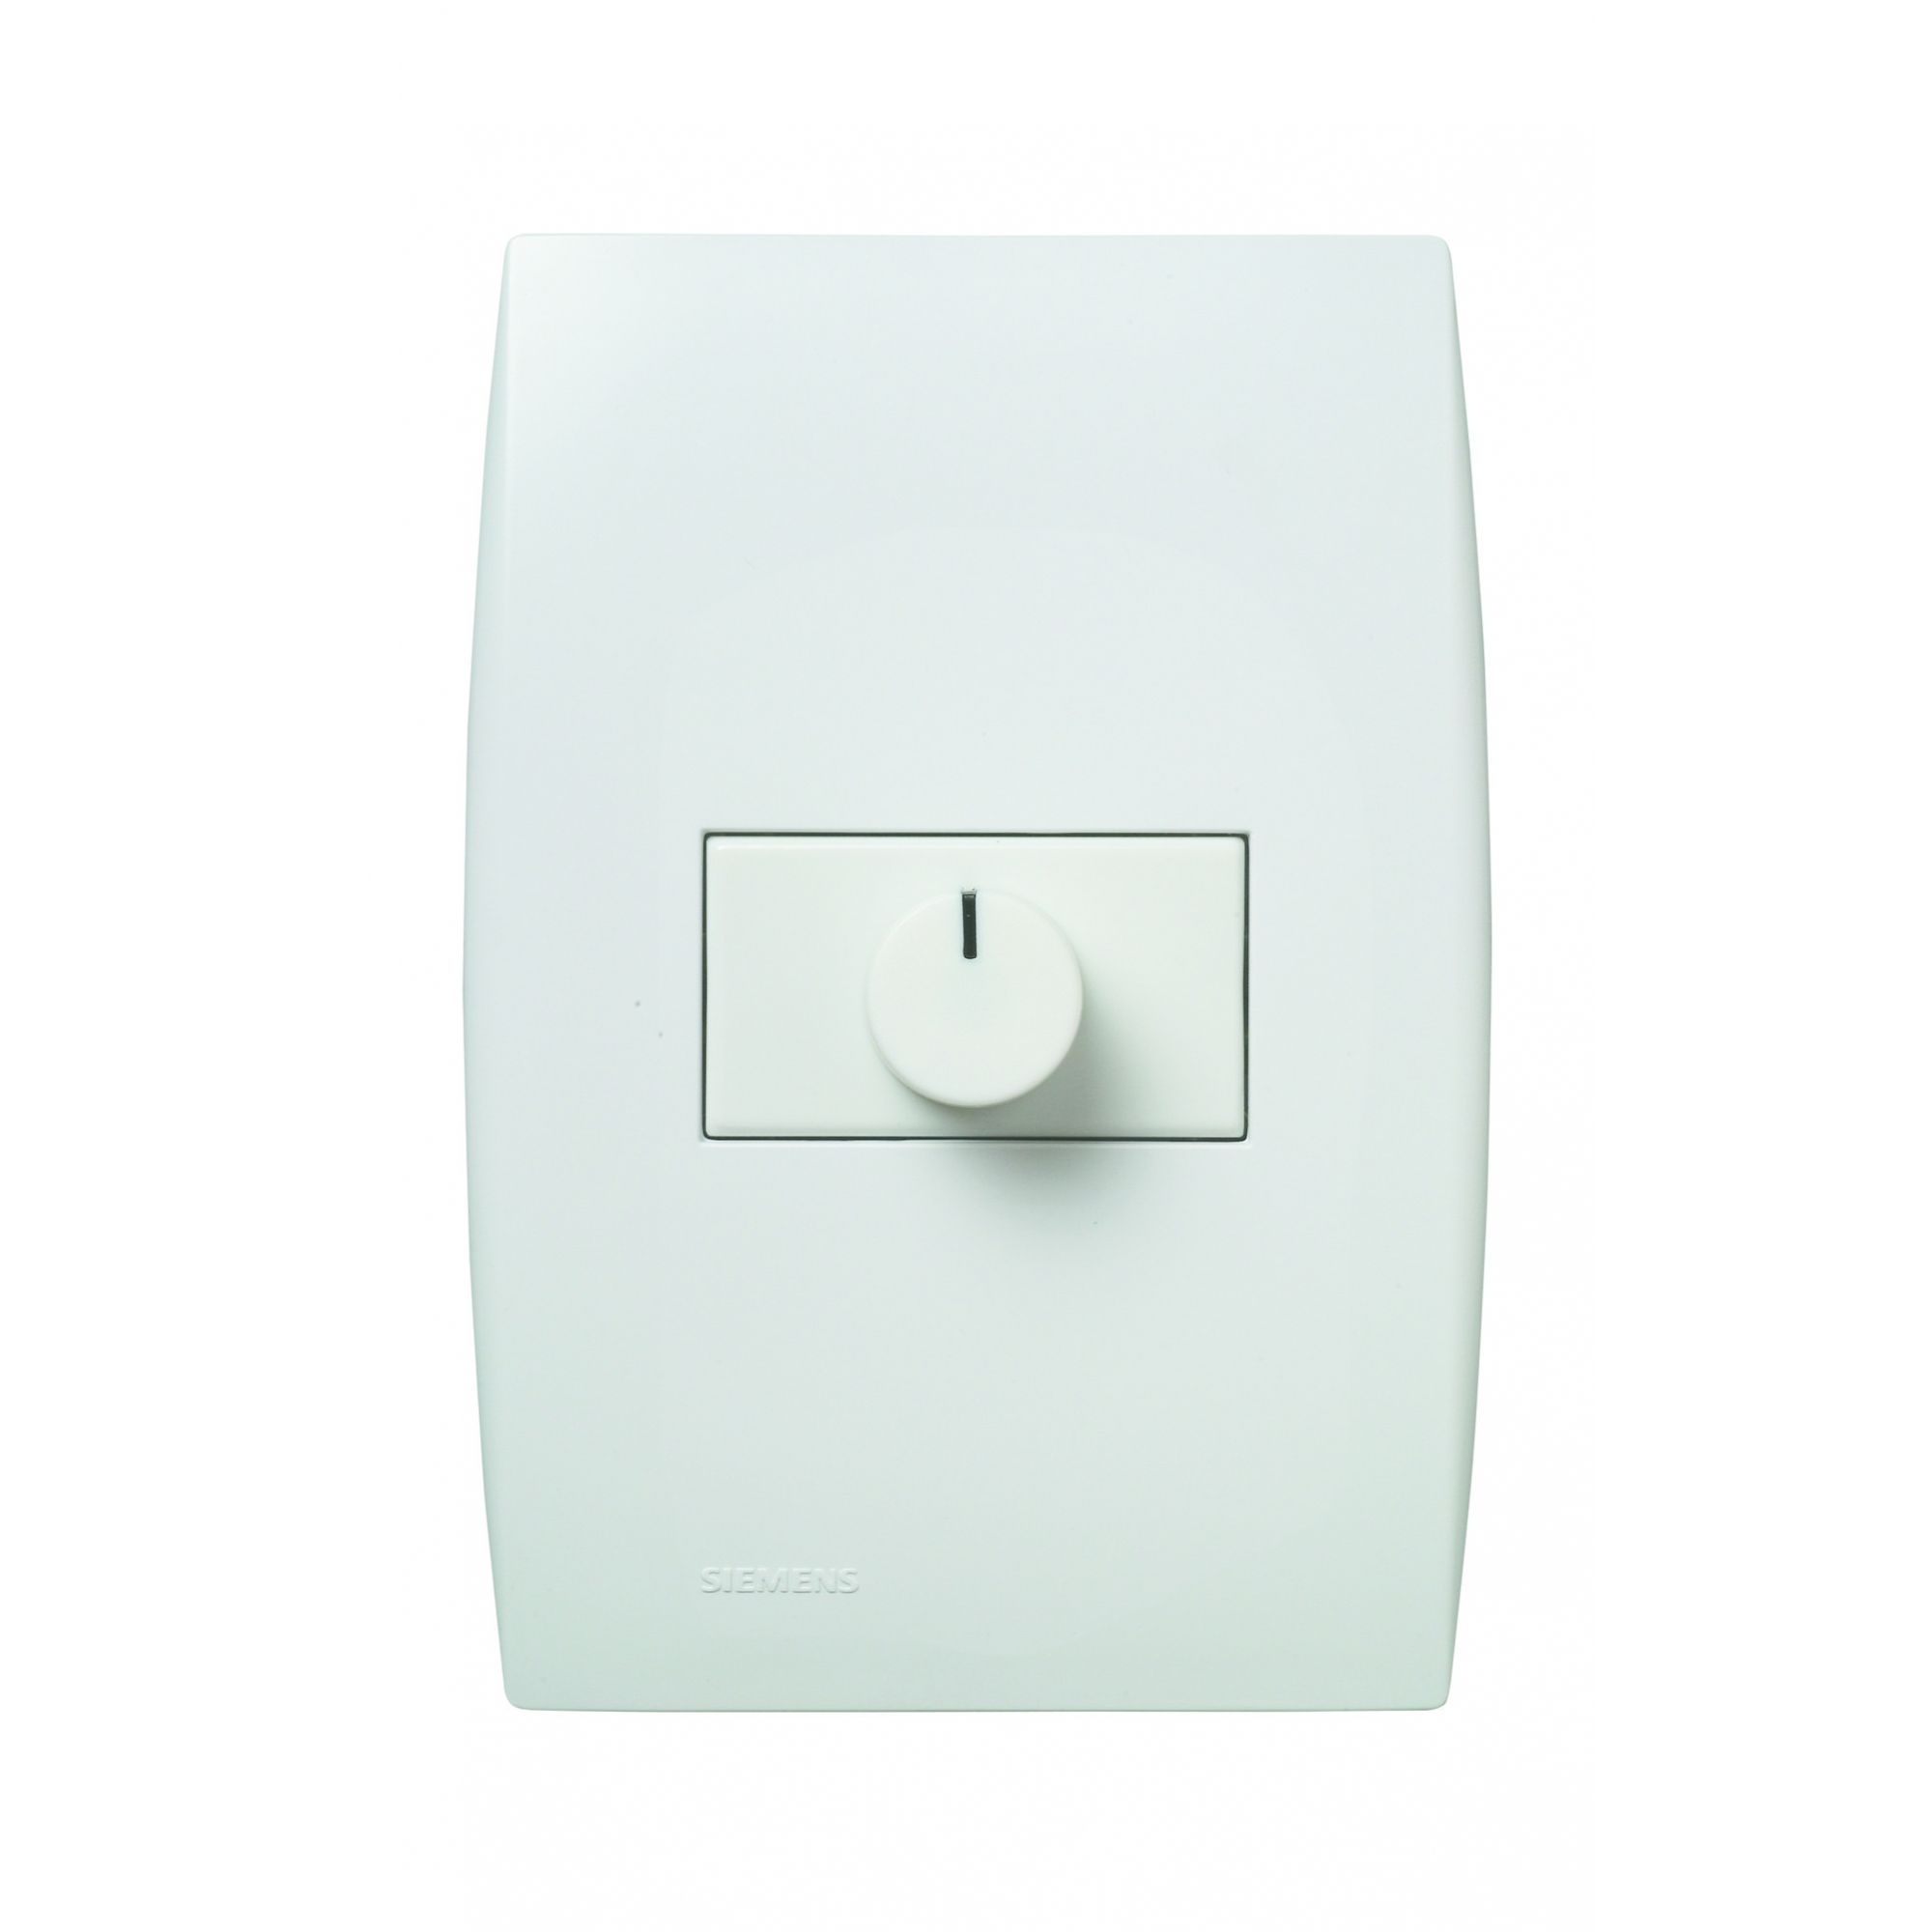 1 DIMMER ROT. BIVOLT – Ilus (5TG9 9085) – LED - Siemens